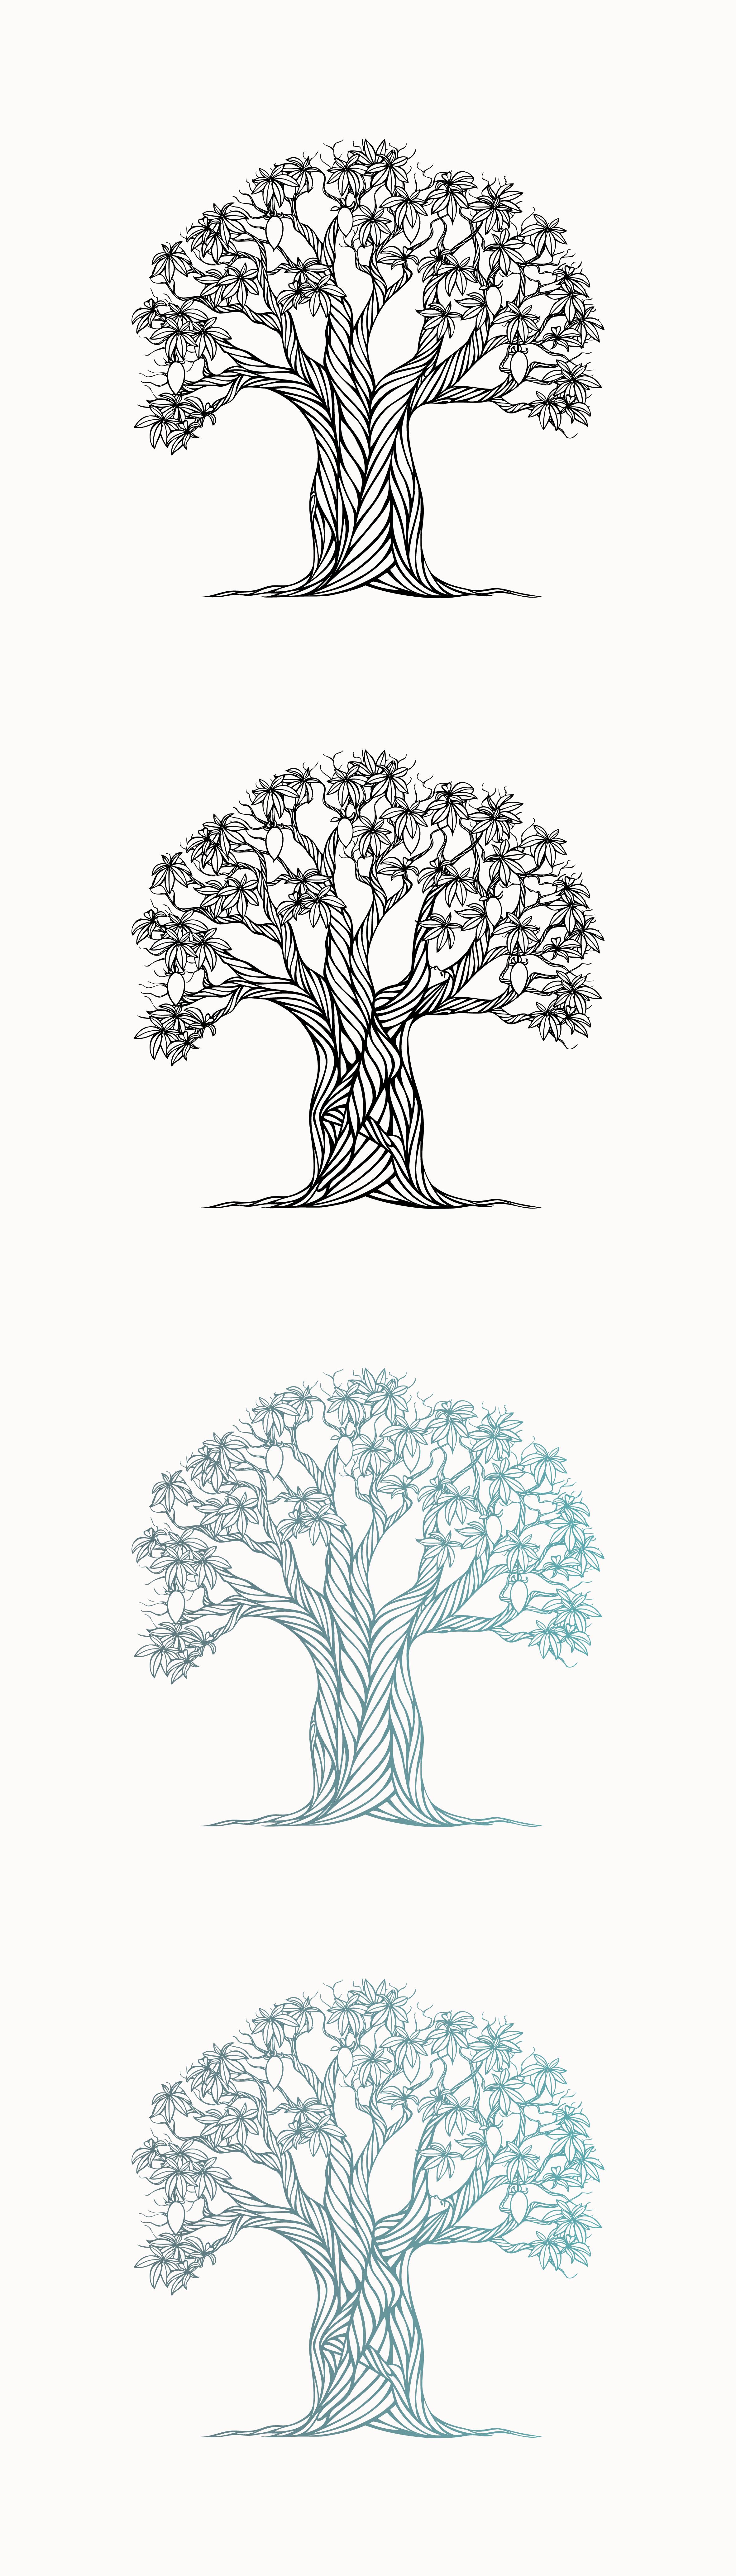 Baobab Tree's Gift illustration